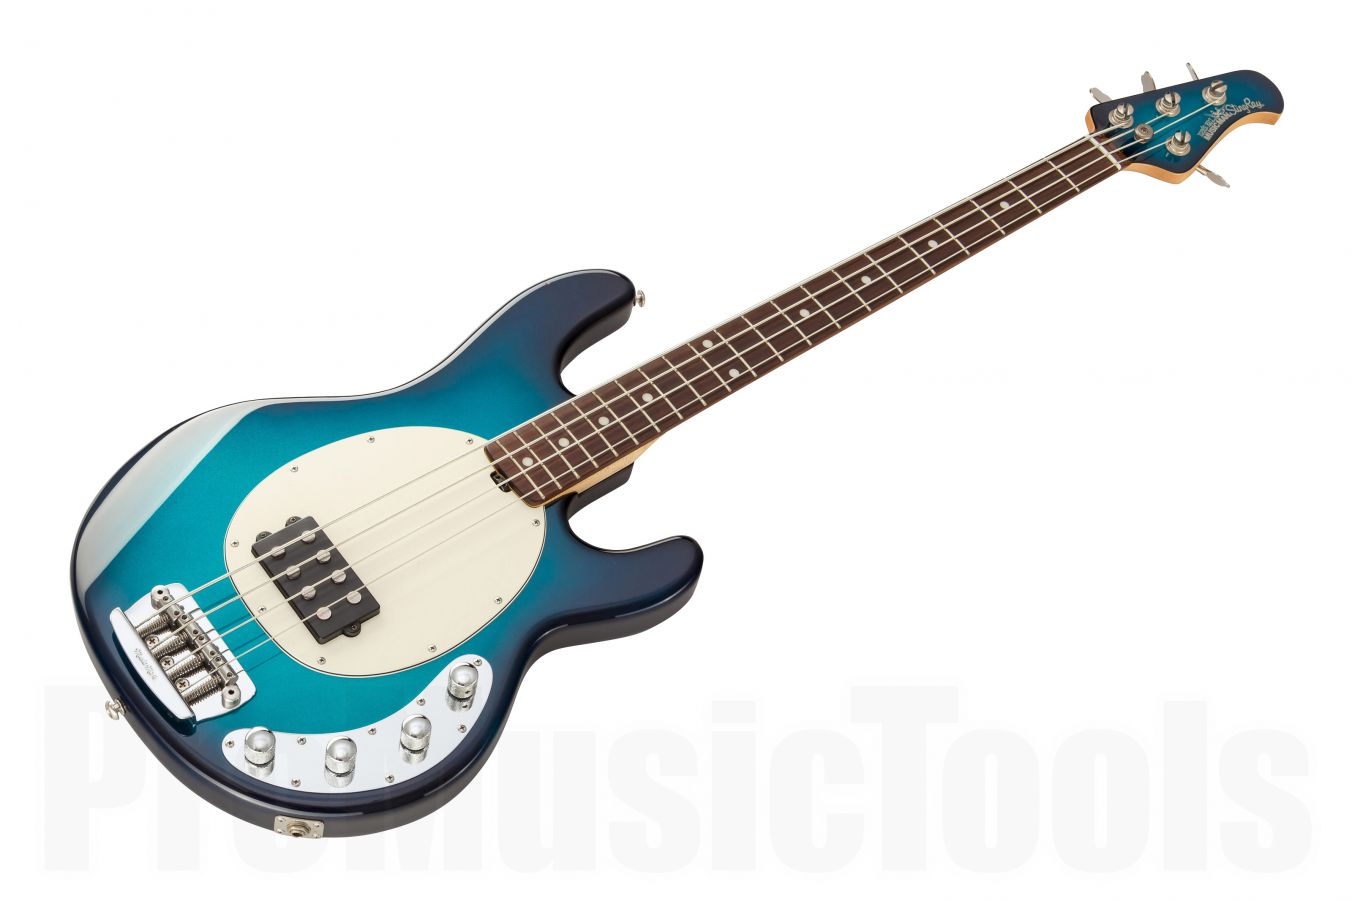 Music Man USA Stingray 4 BD - Blue Dawn RW MH